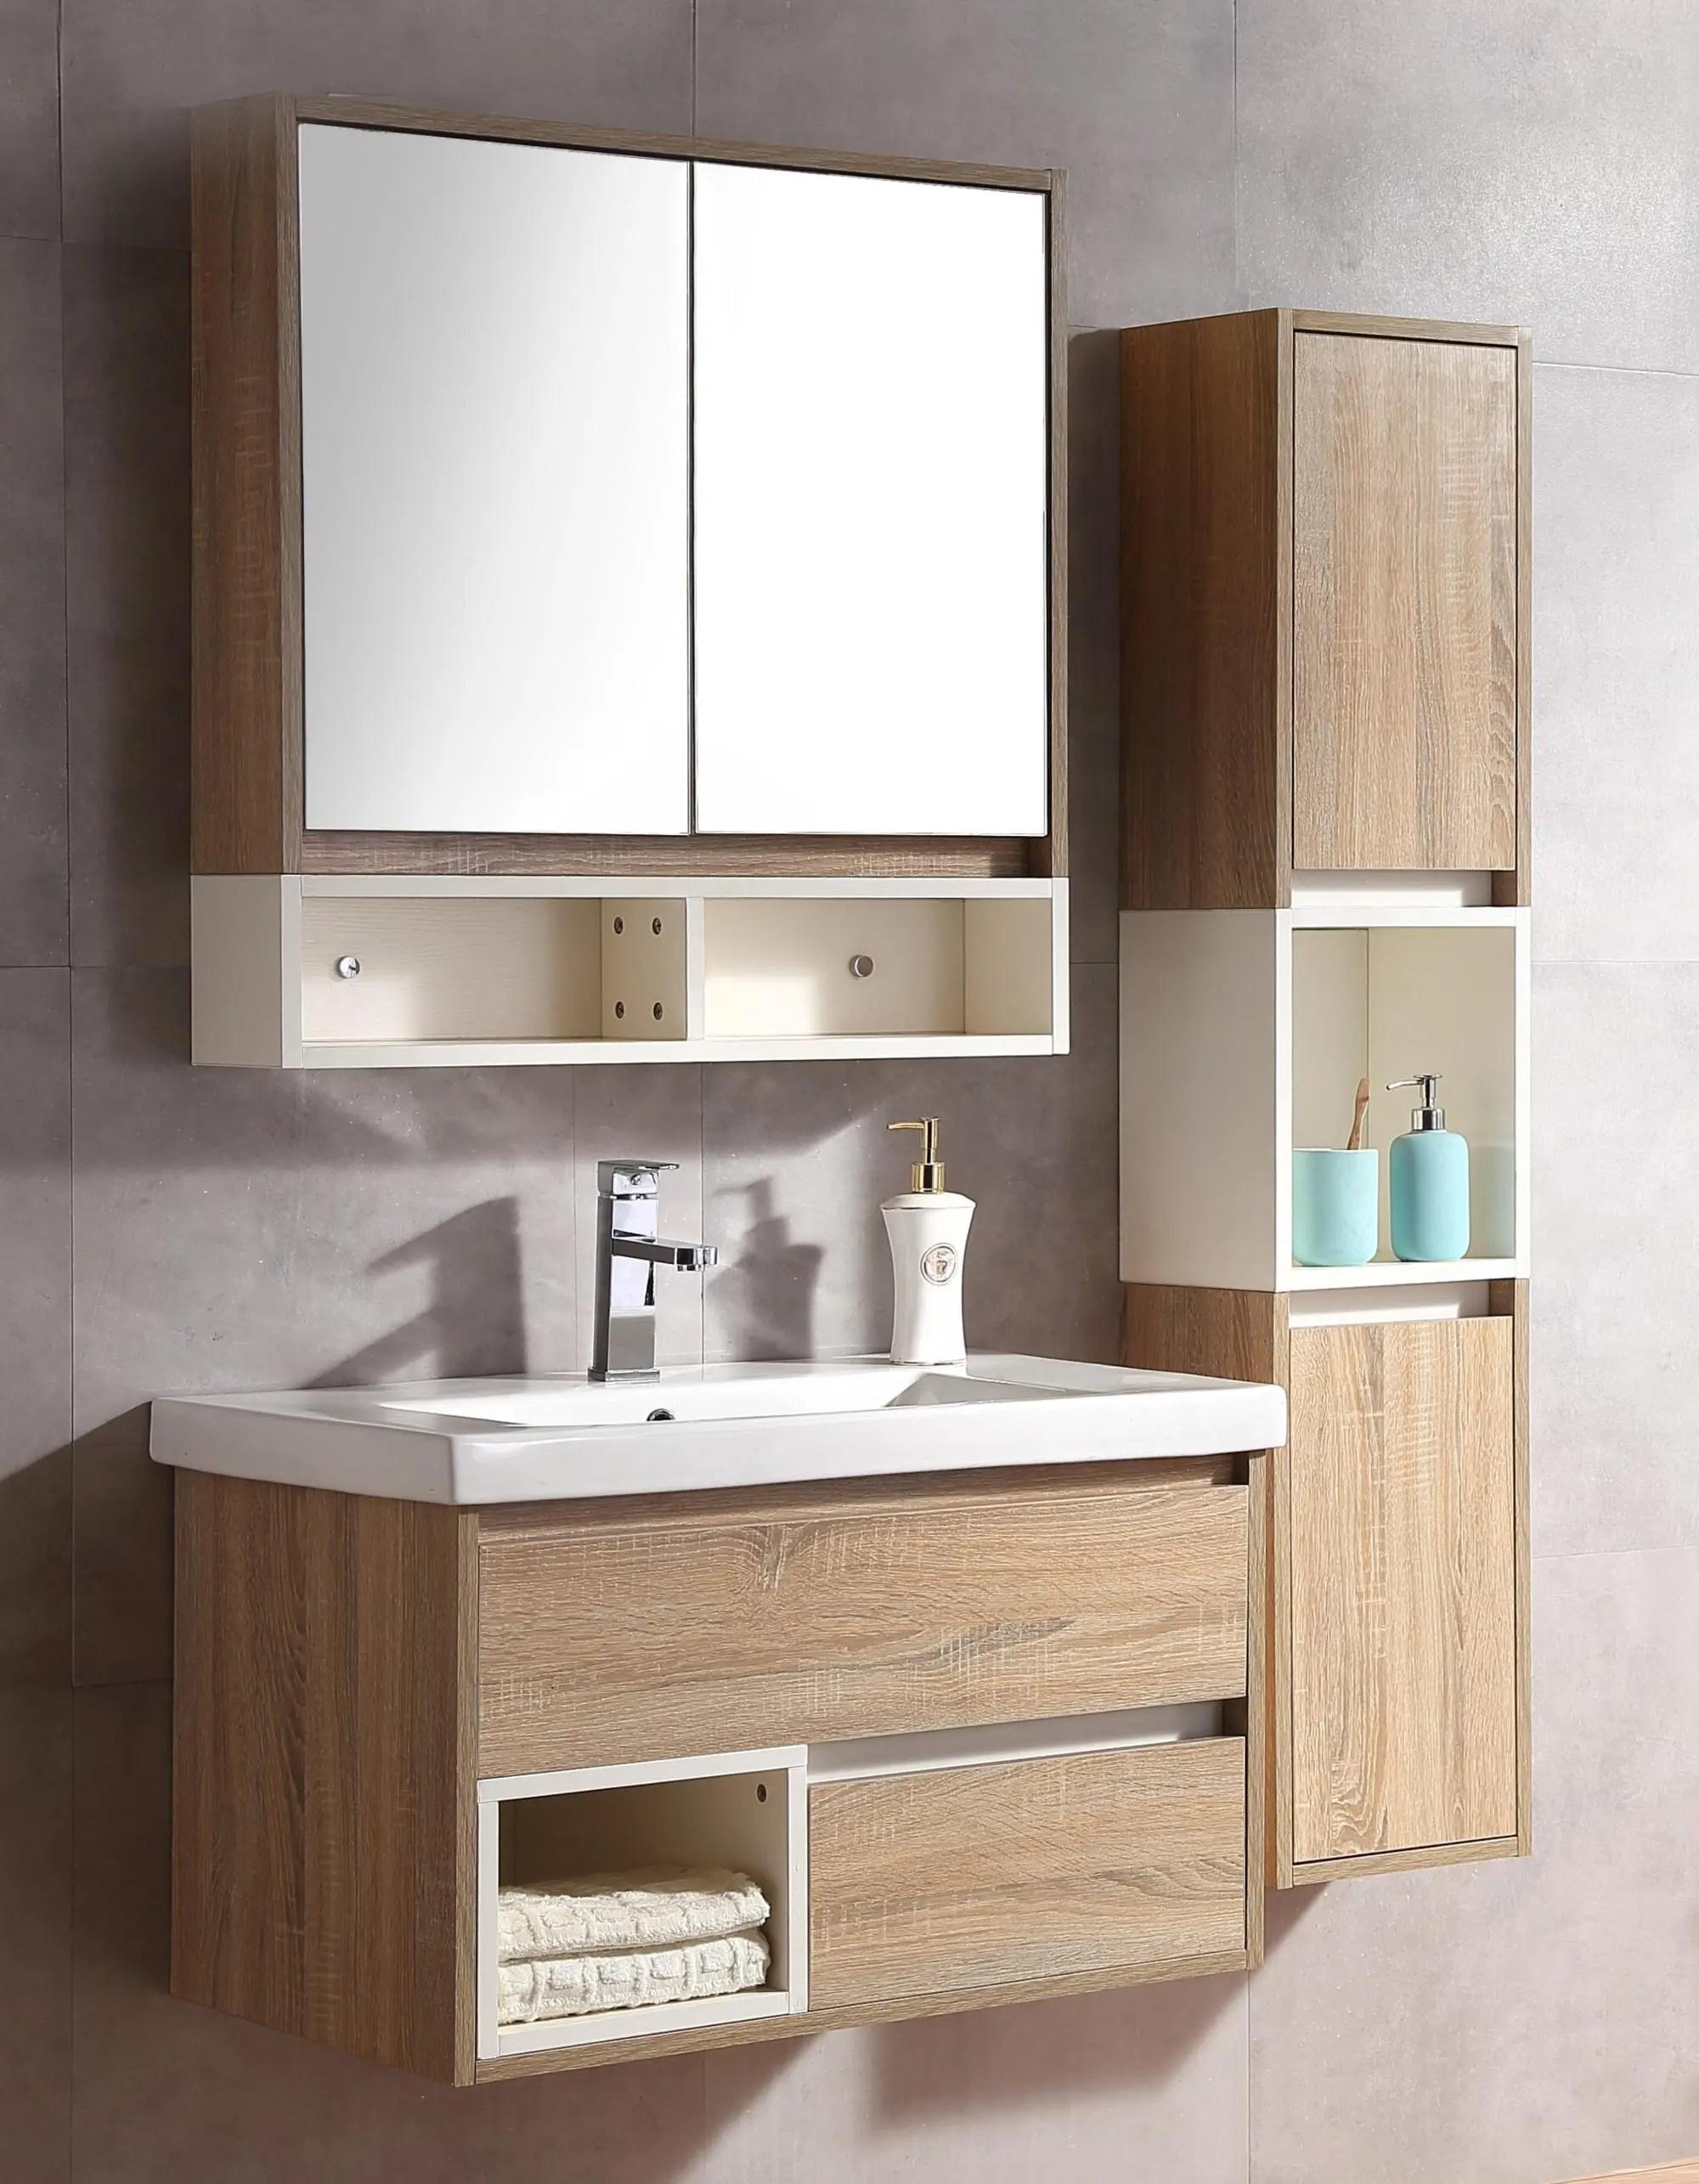 32 double sink bathroom vanity set floating bath cabinet with mirror and shelf buy bathrooms cabinet with double sink floating bath cabinet bath